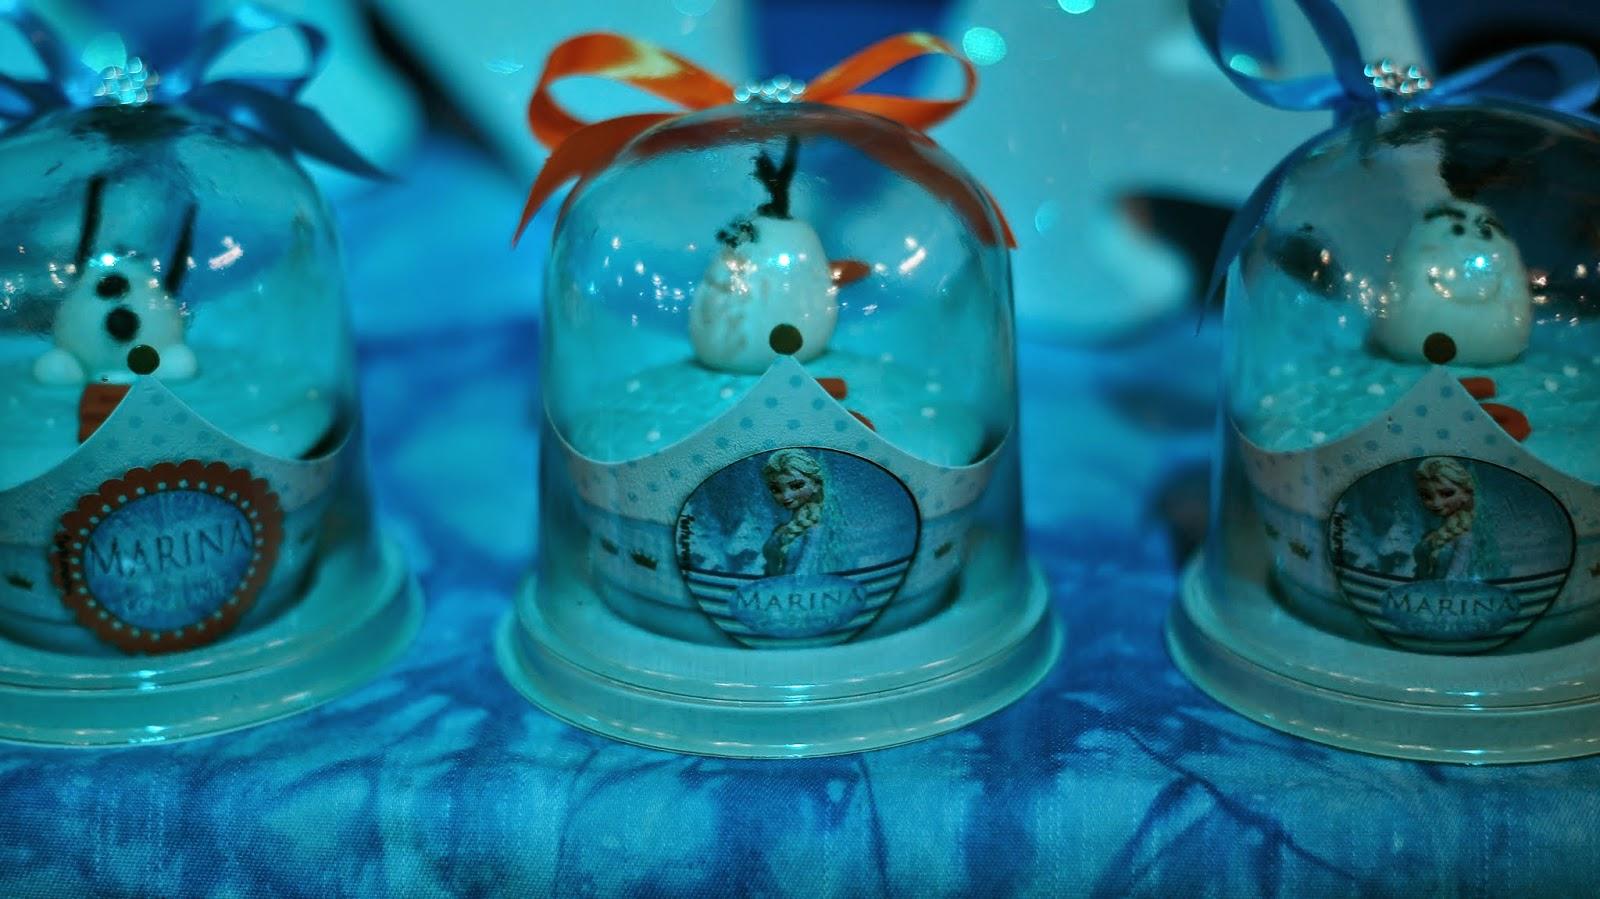 Imagens Frozen Uma Aventura Congelante Top festa pronta: frozen! uma aventura congelante